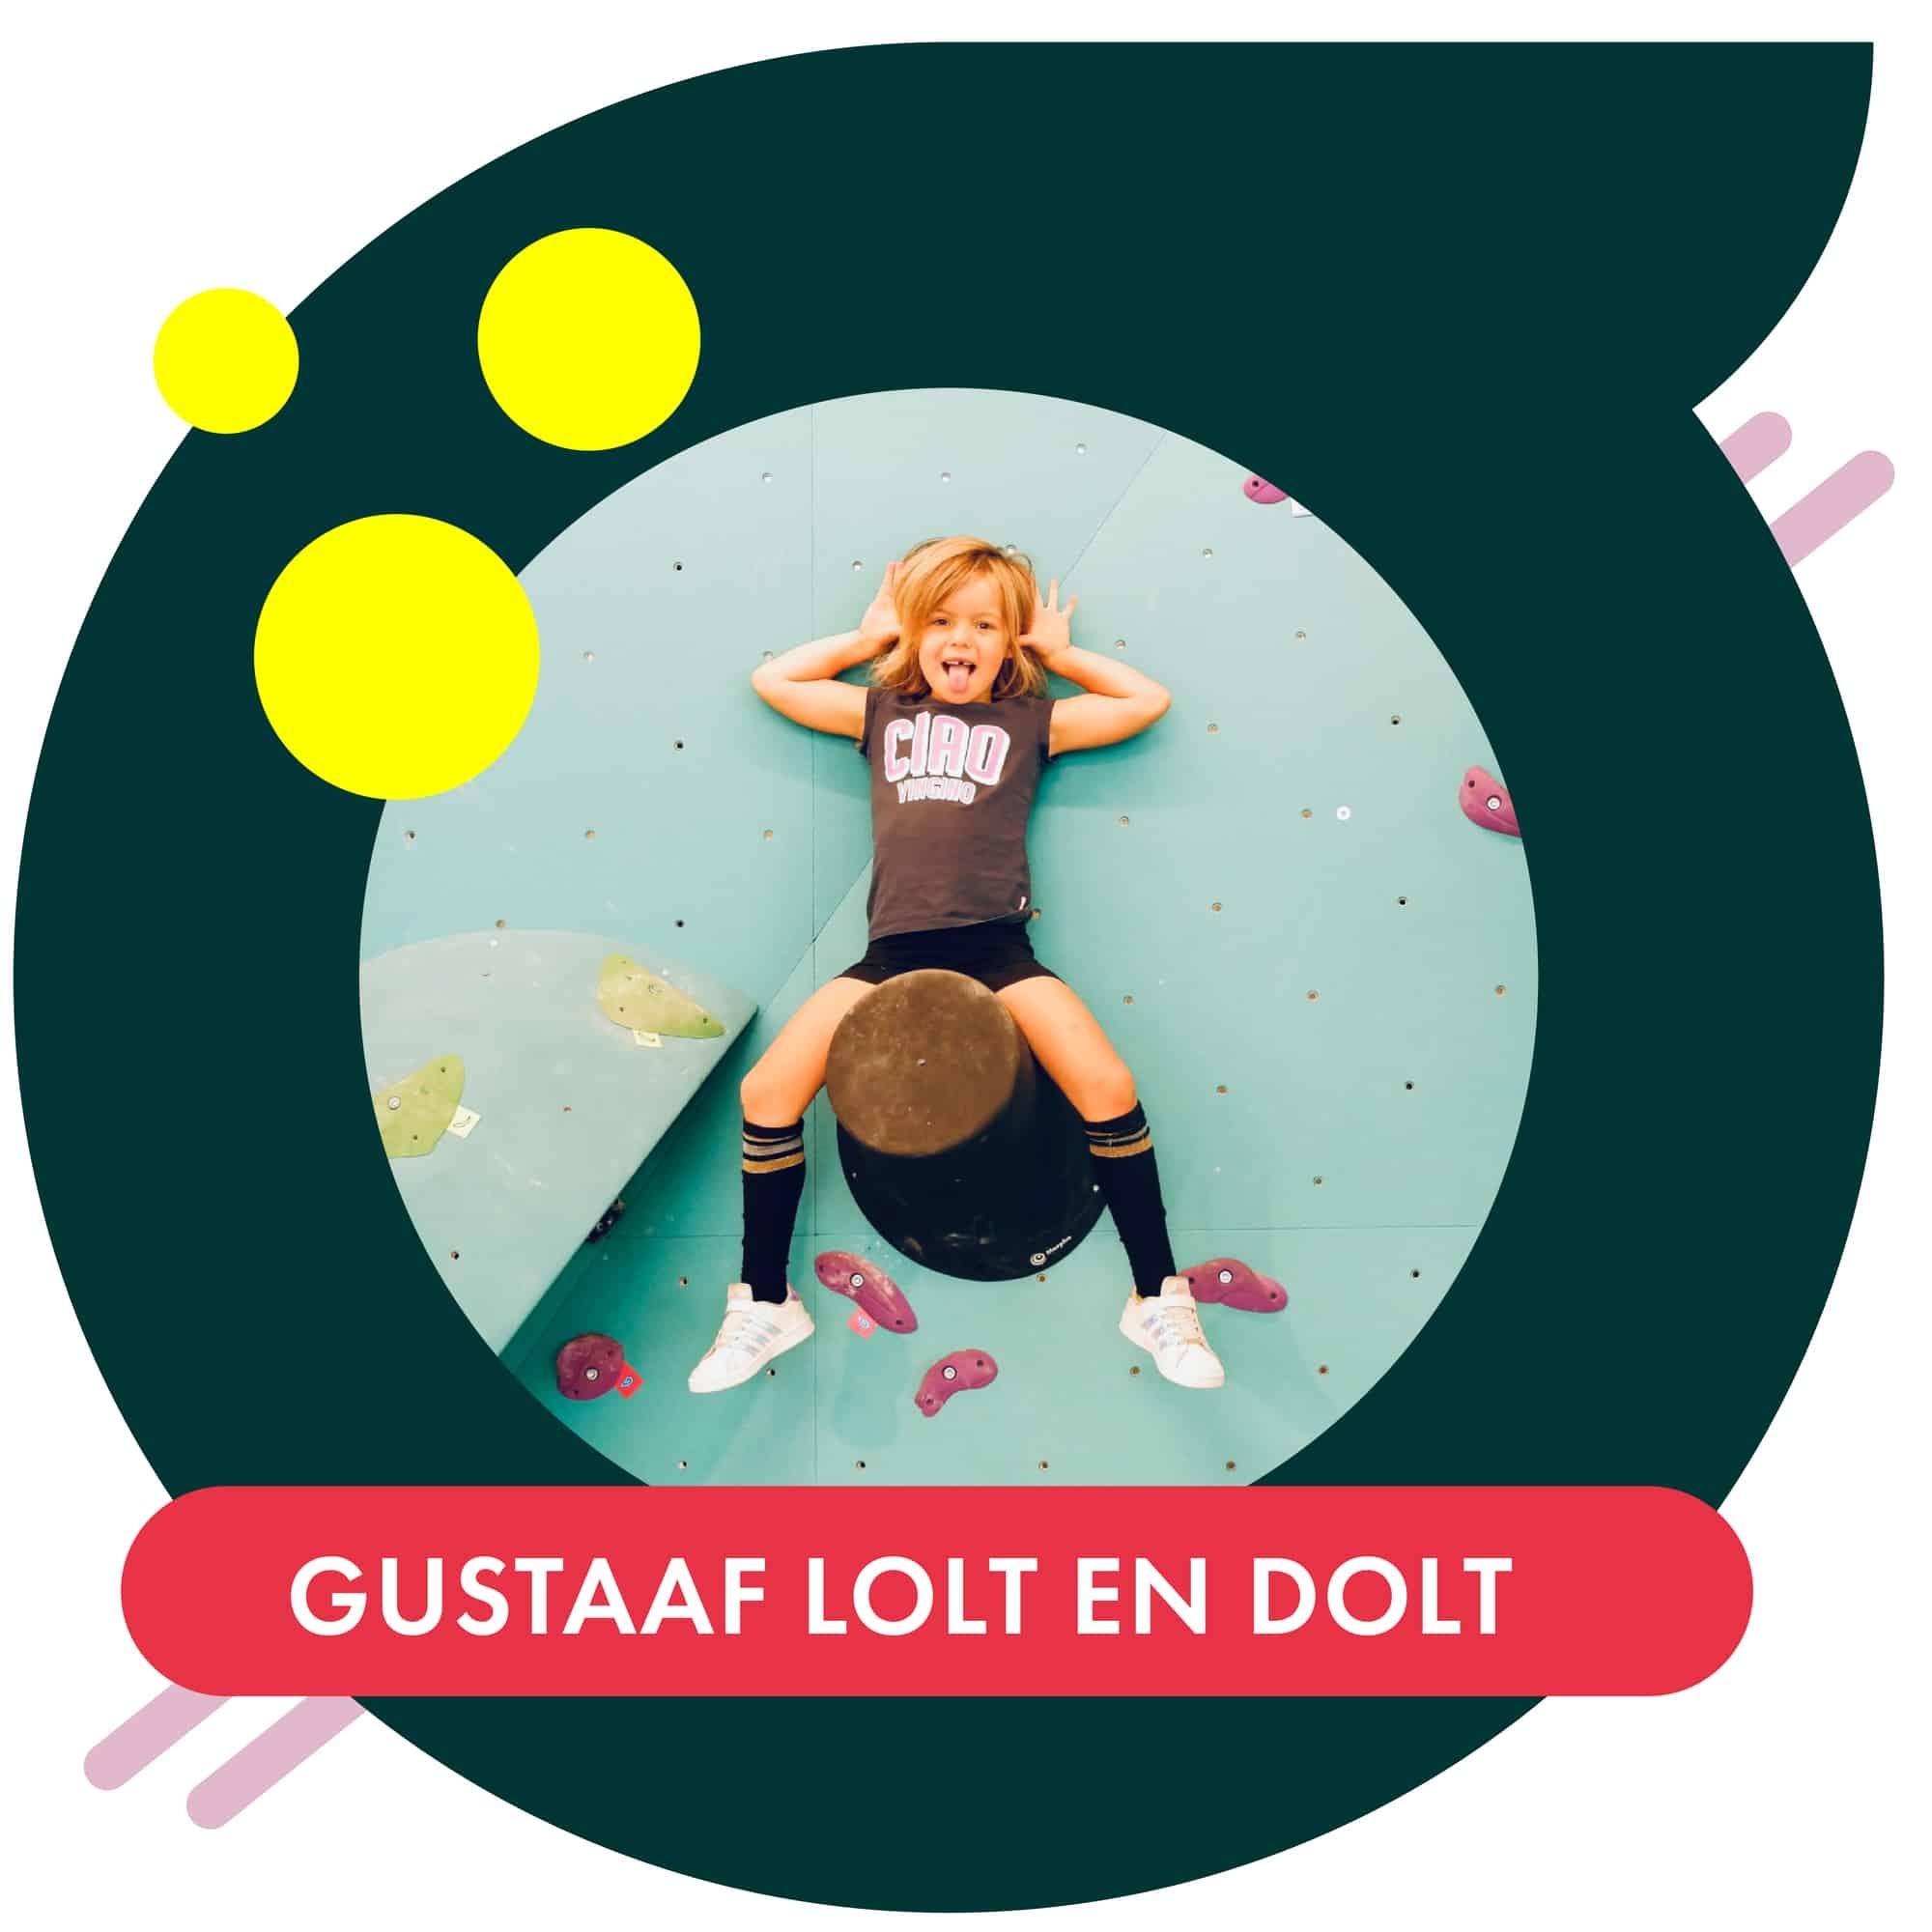 website foto en visuals gustaaf 10